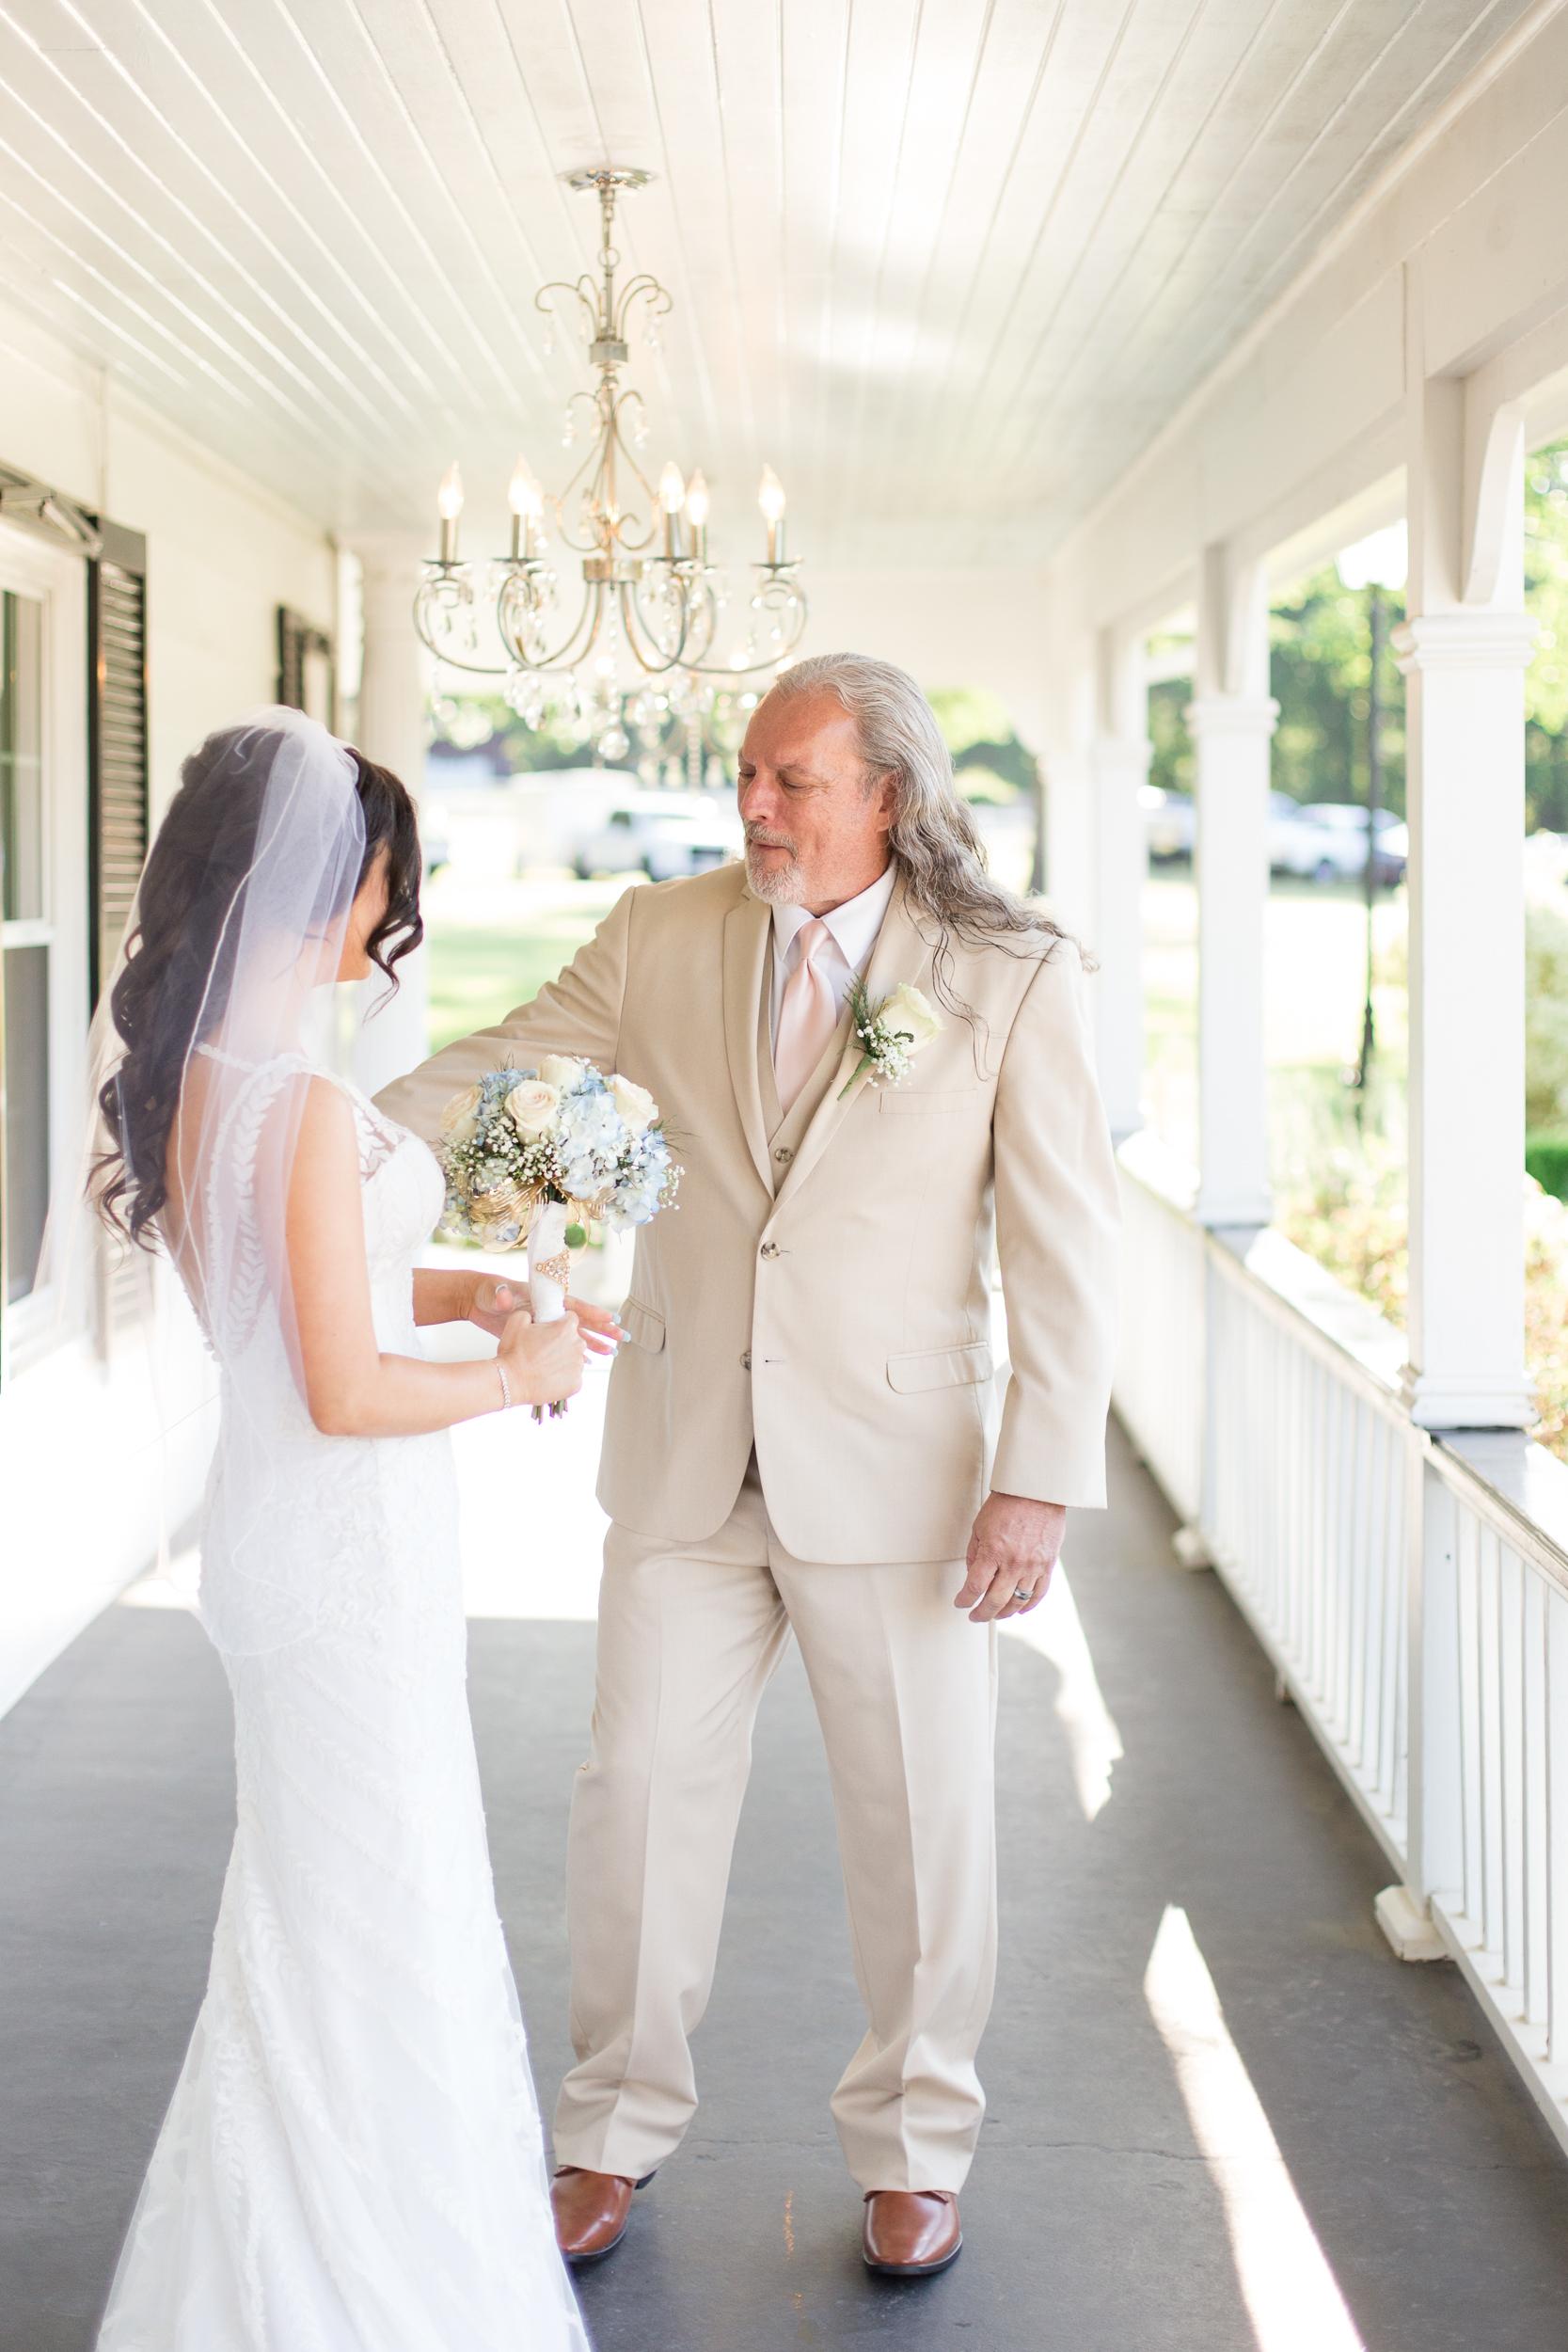 Zihlman-East TX Wedding_Kelsie Hendricks Photography_The Folmar Tyler Texas-97.jpg